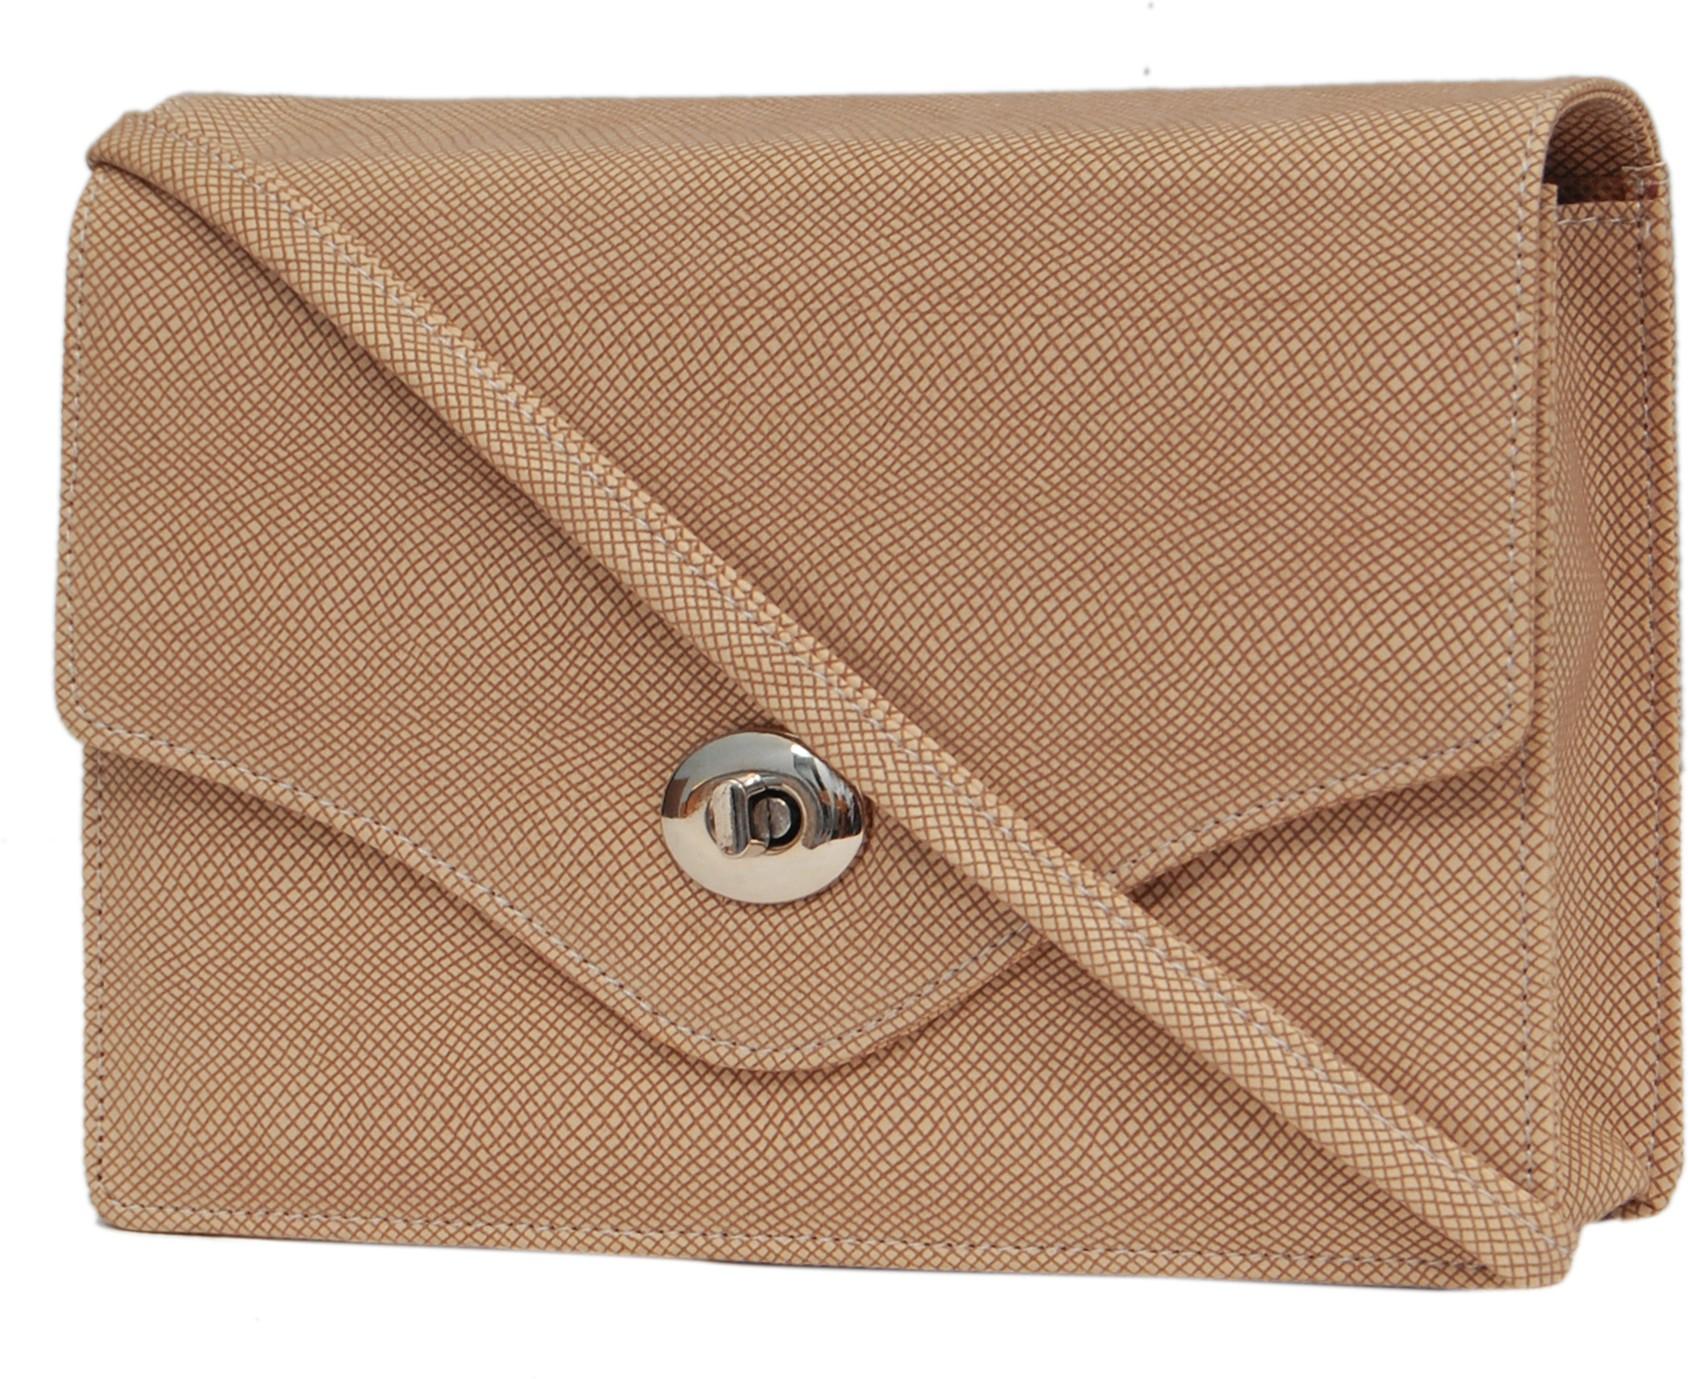 Sling bag below 500 - Borse Women Beige Pu Sling Bag